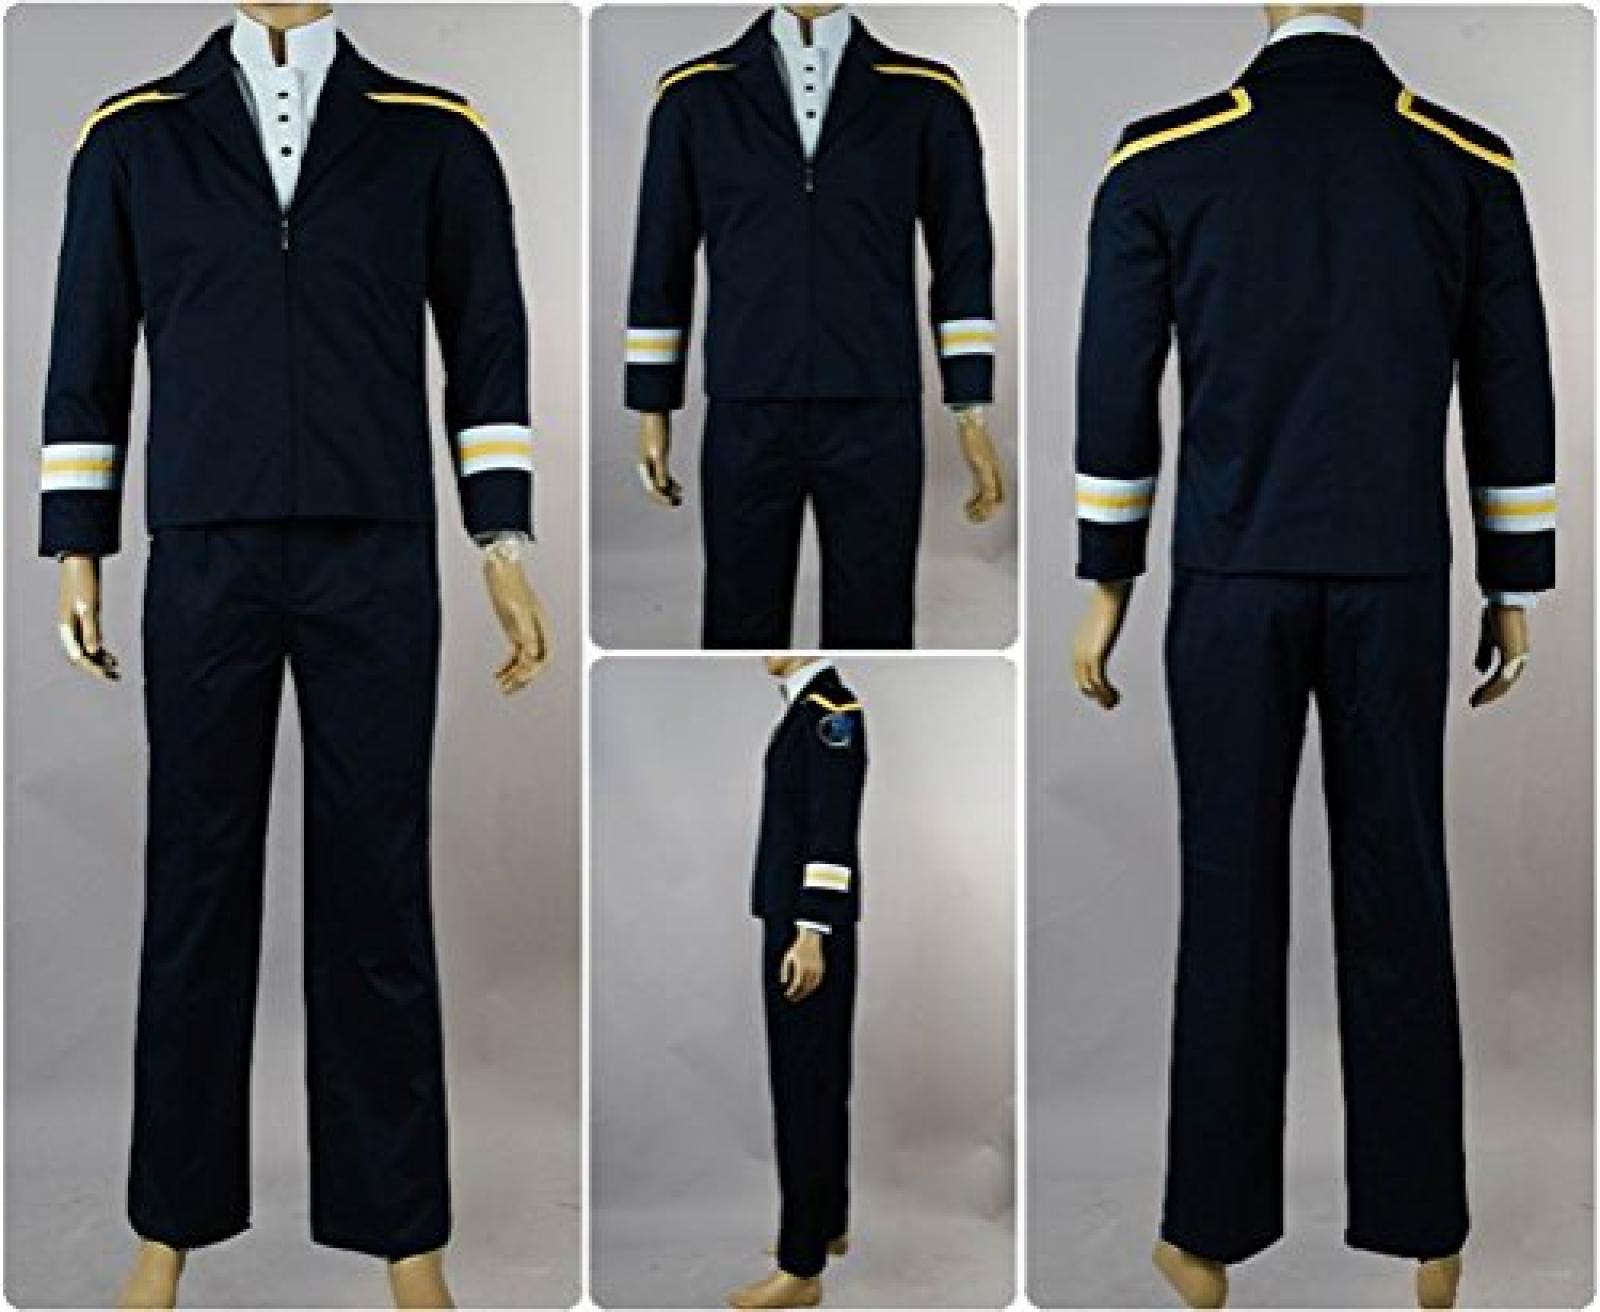 Star Trek Enterprise Archer Uniform Kostuem Set